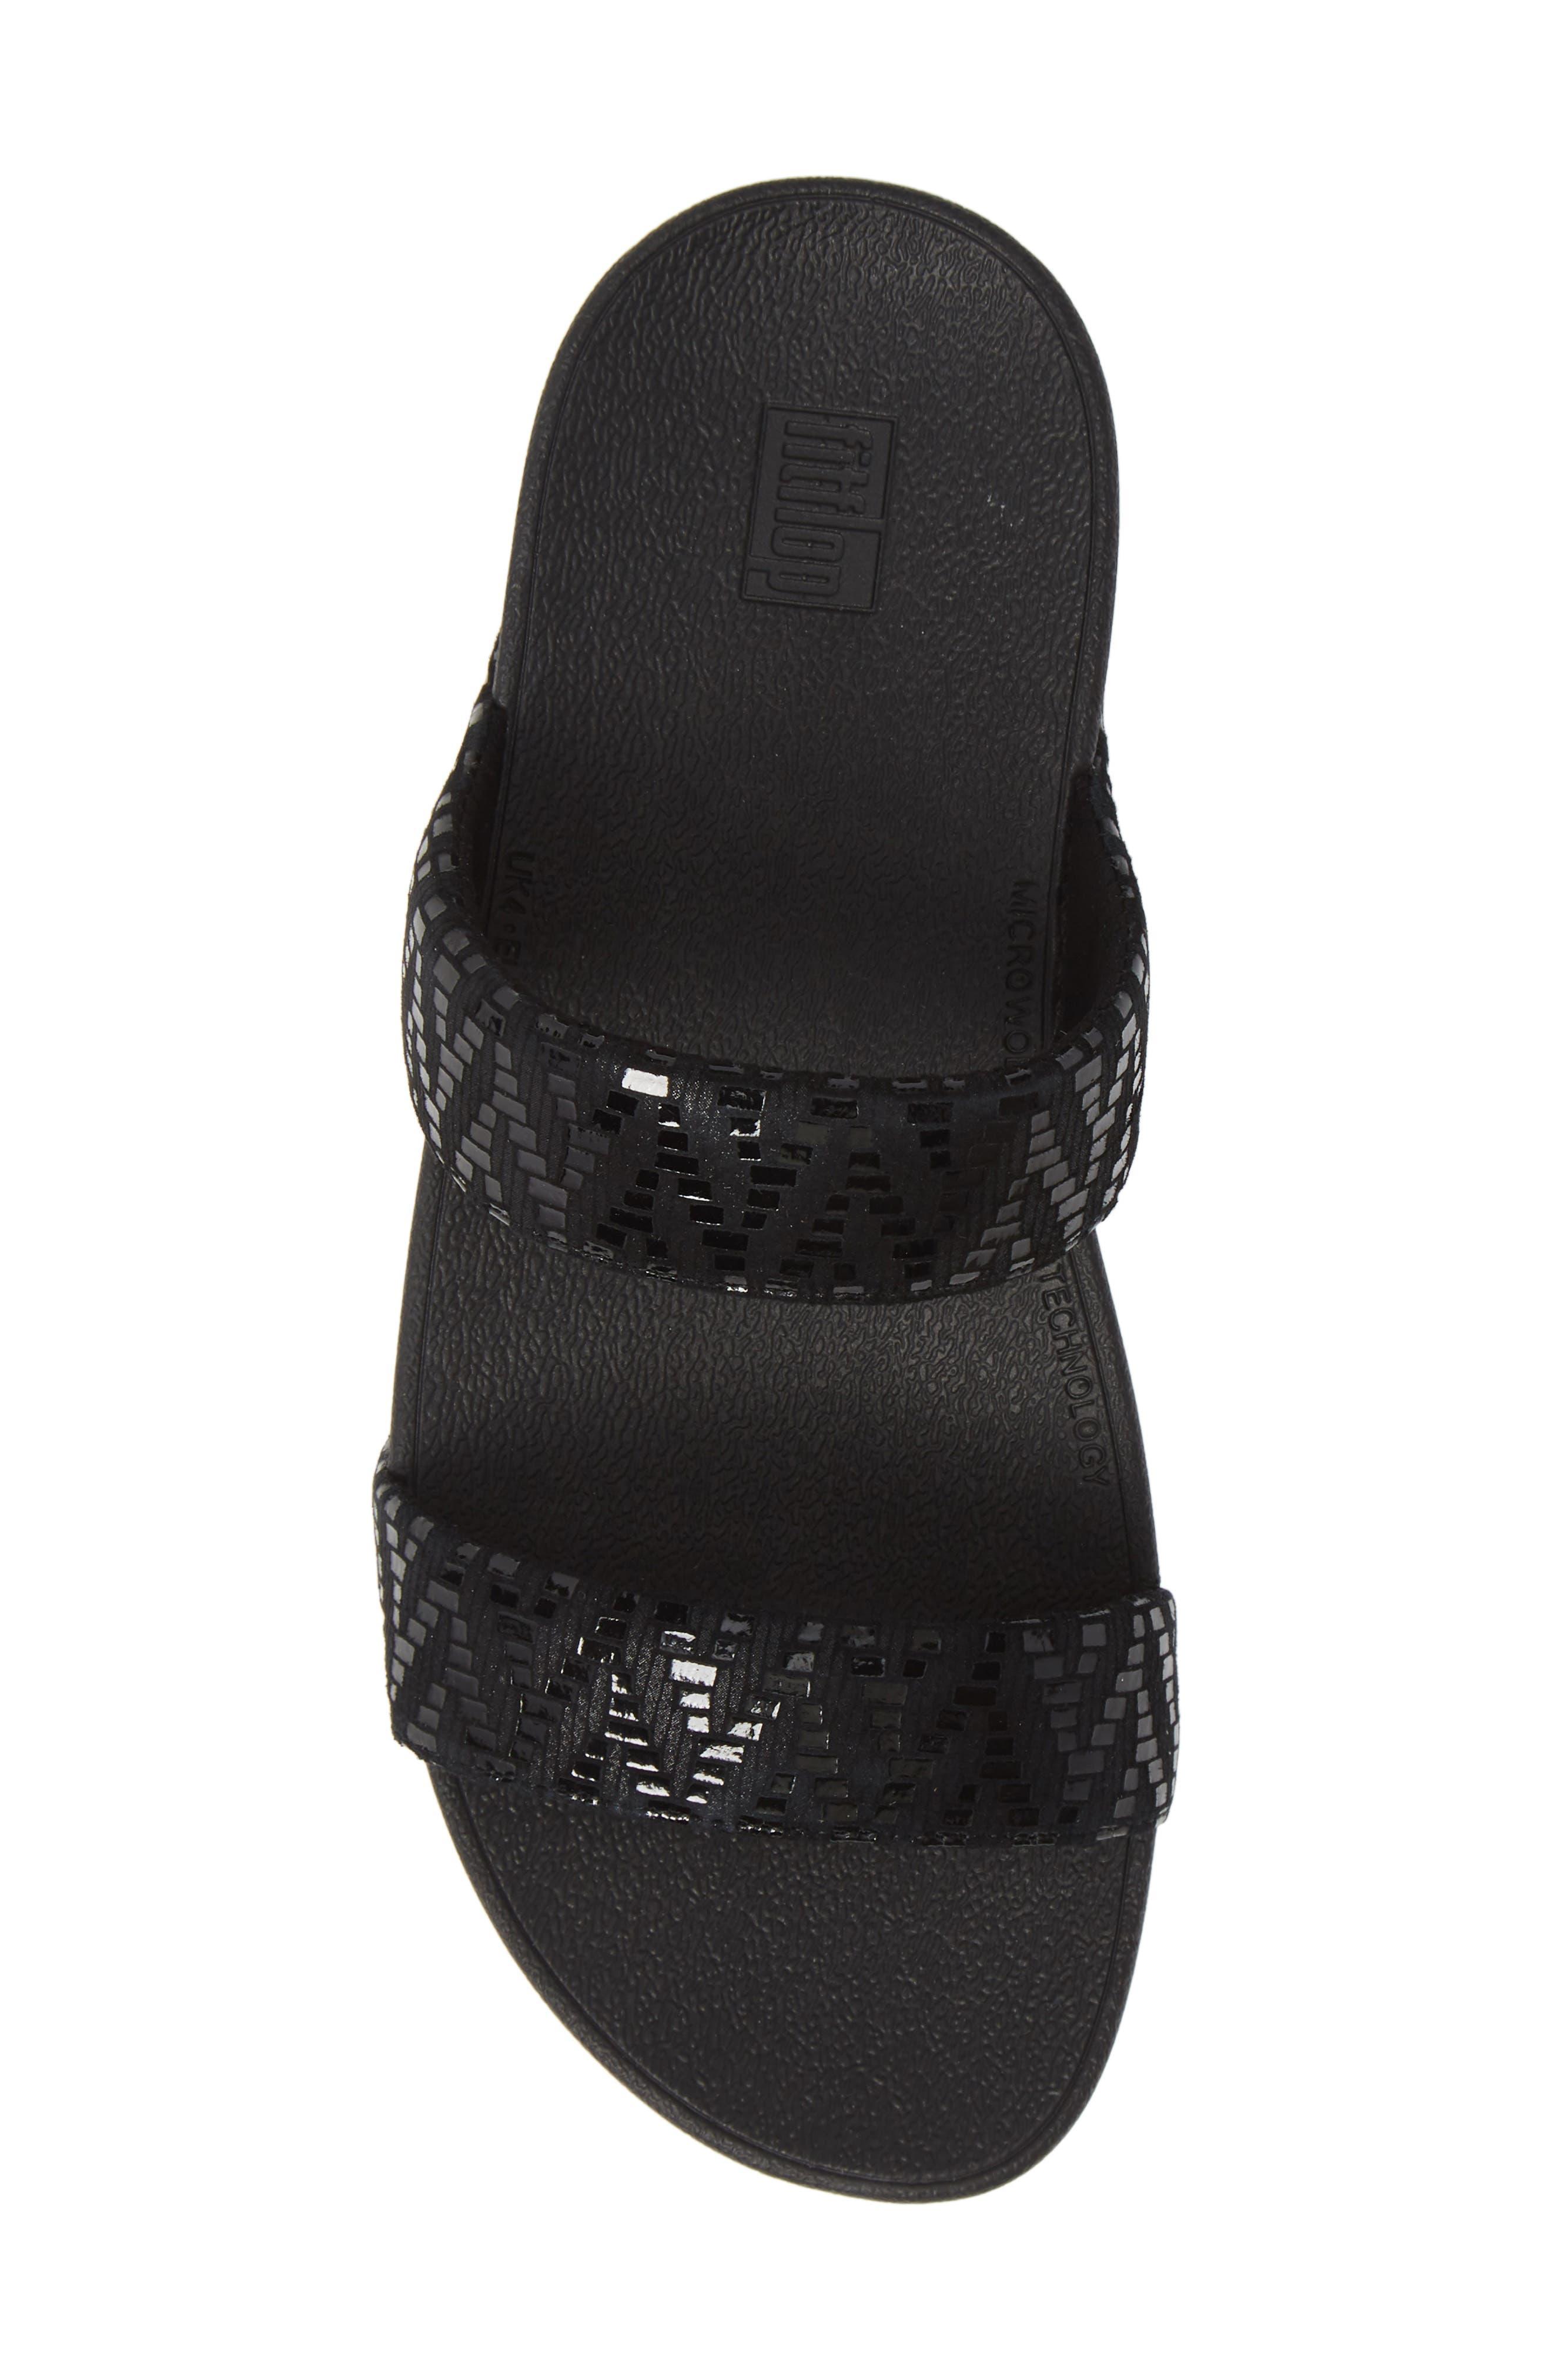 FITFLOP, Lottie Chevron Wedge Slide Sandal, Alternate thumbnail 5, color, BLACK FABRIC